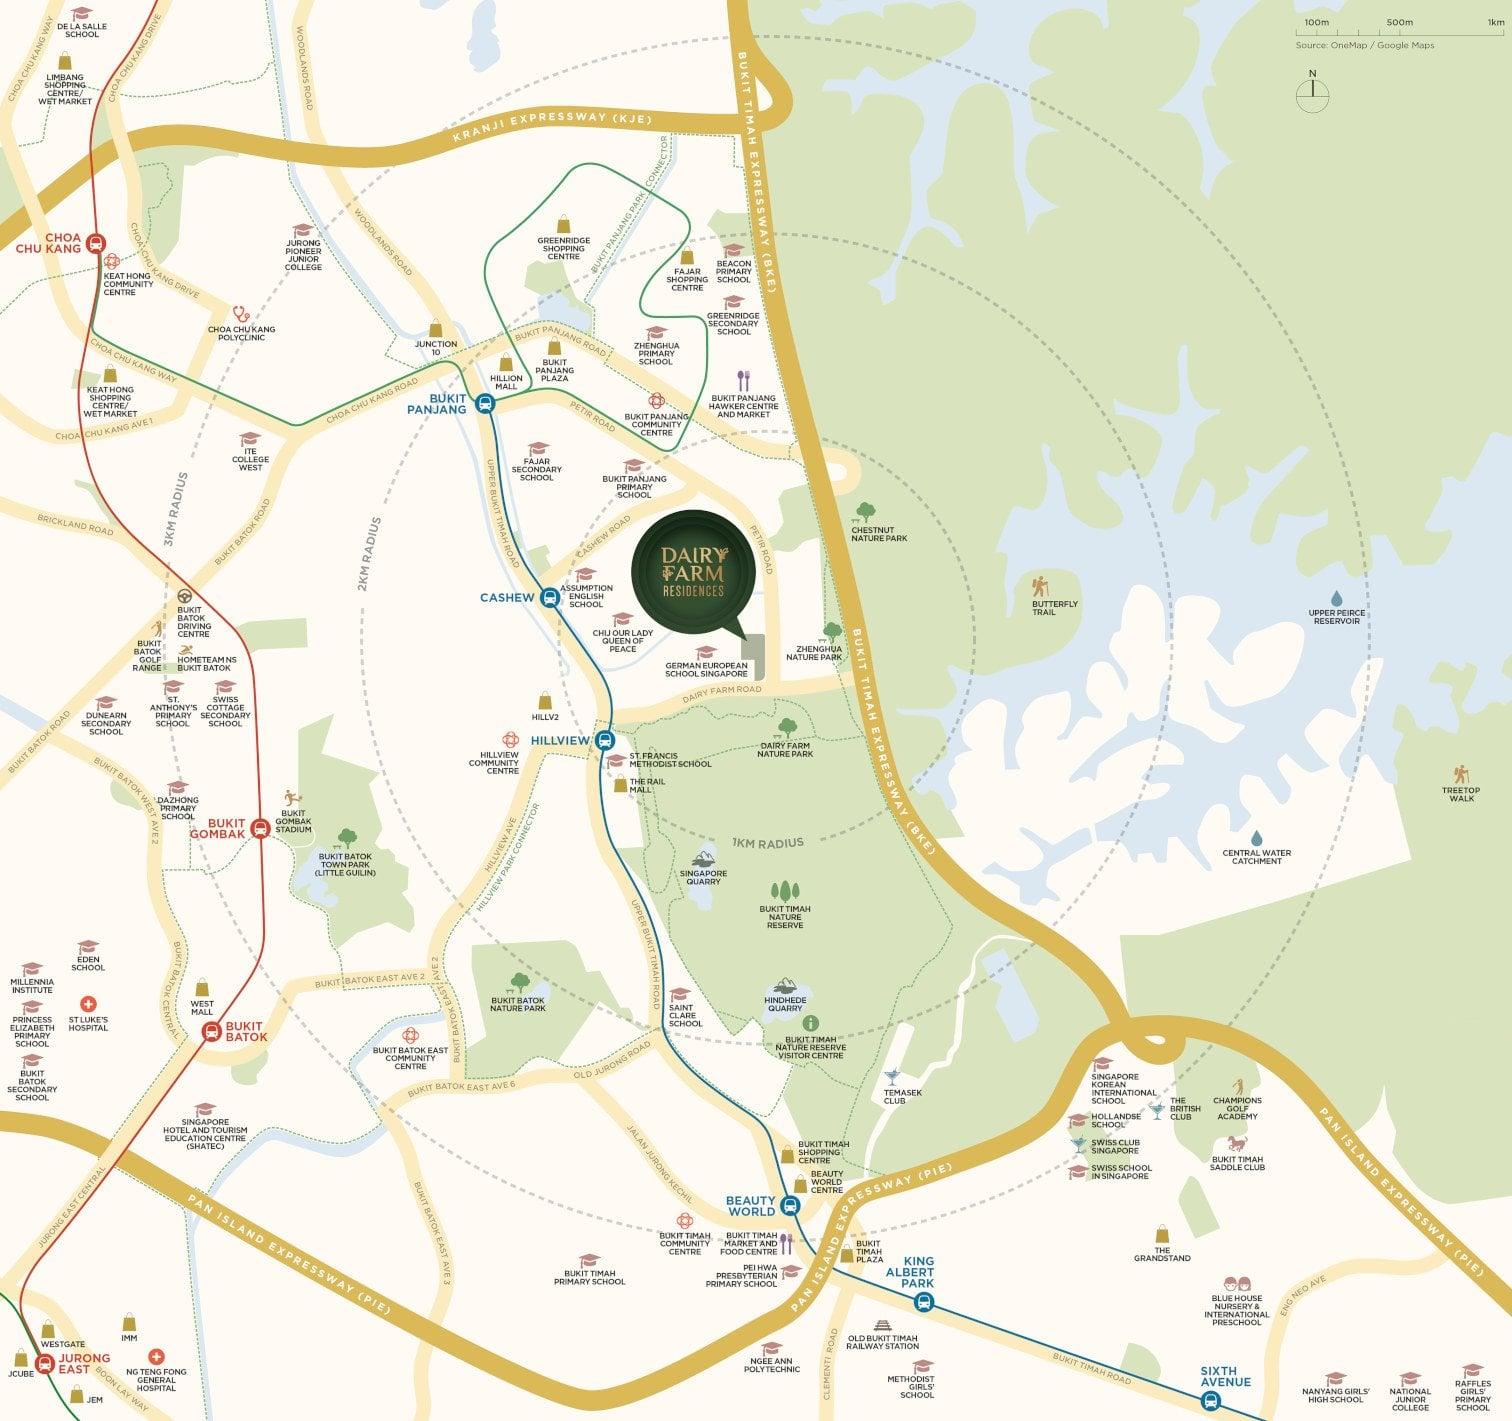 Dairy-Farm-Residences-Location-Map